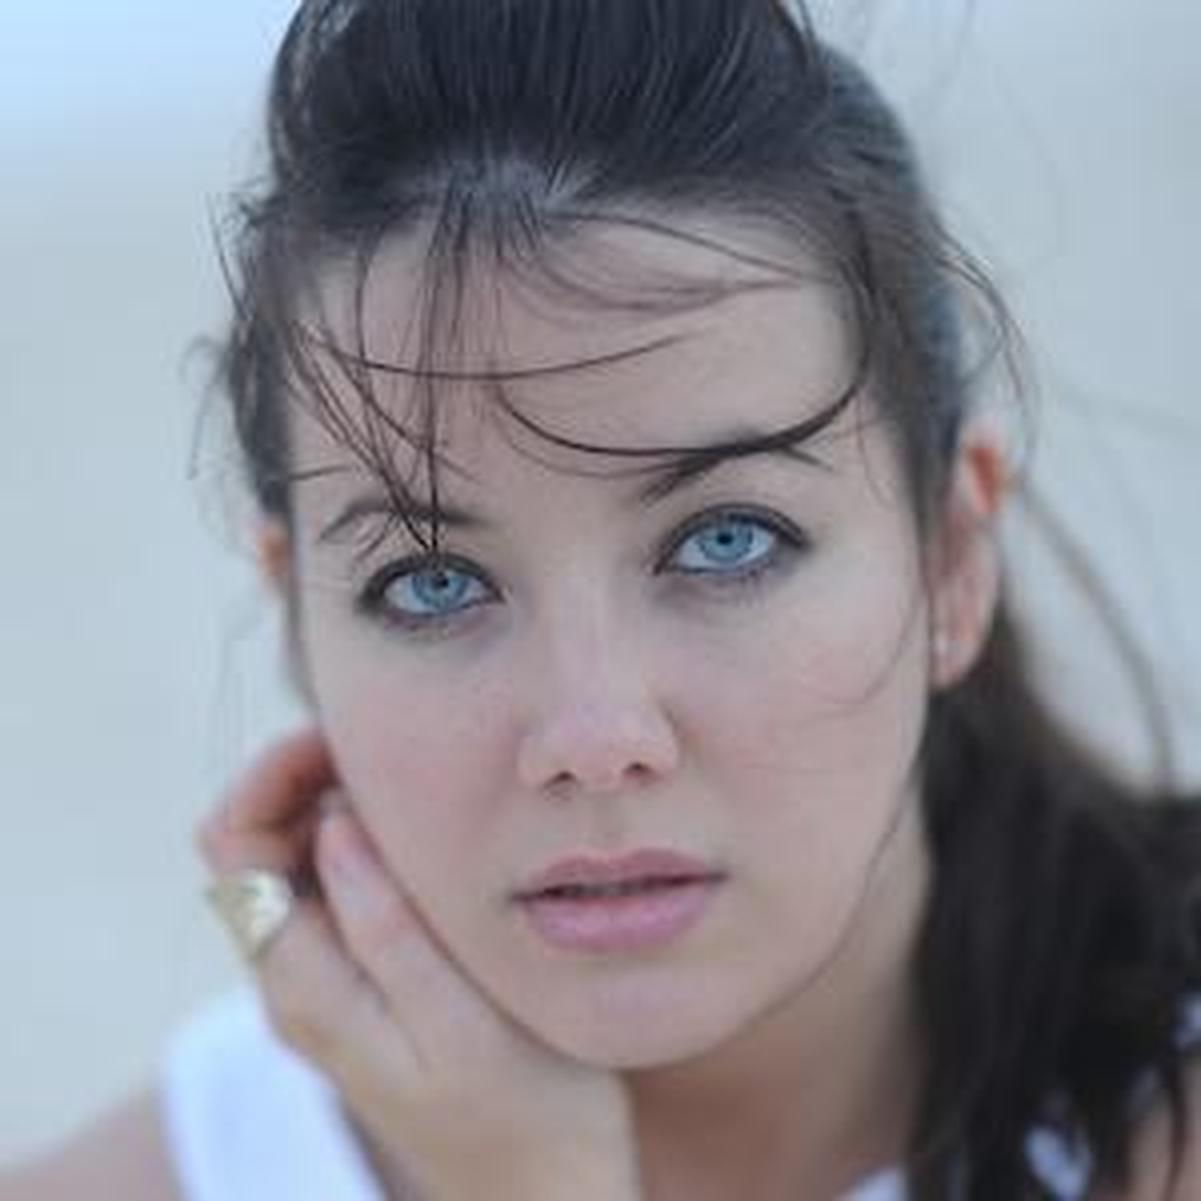 Meagan Cignoli